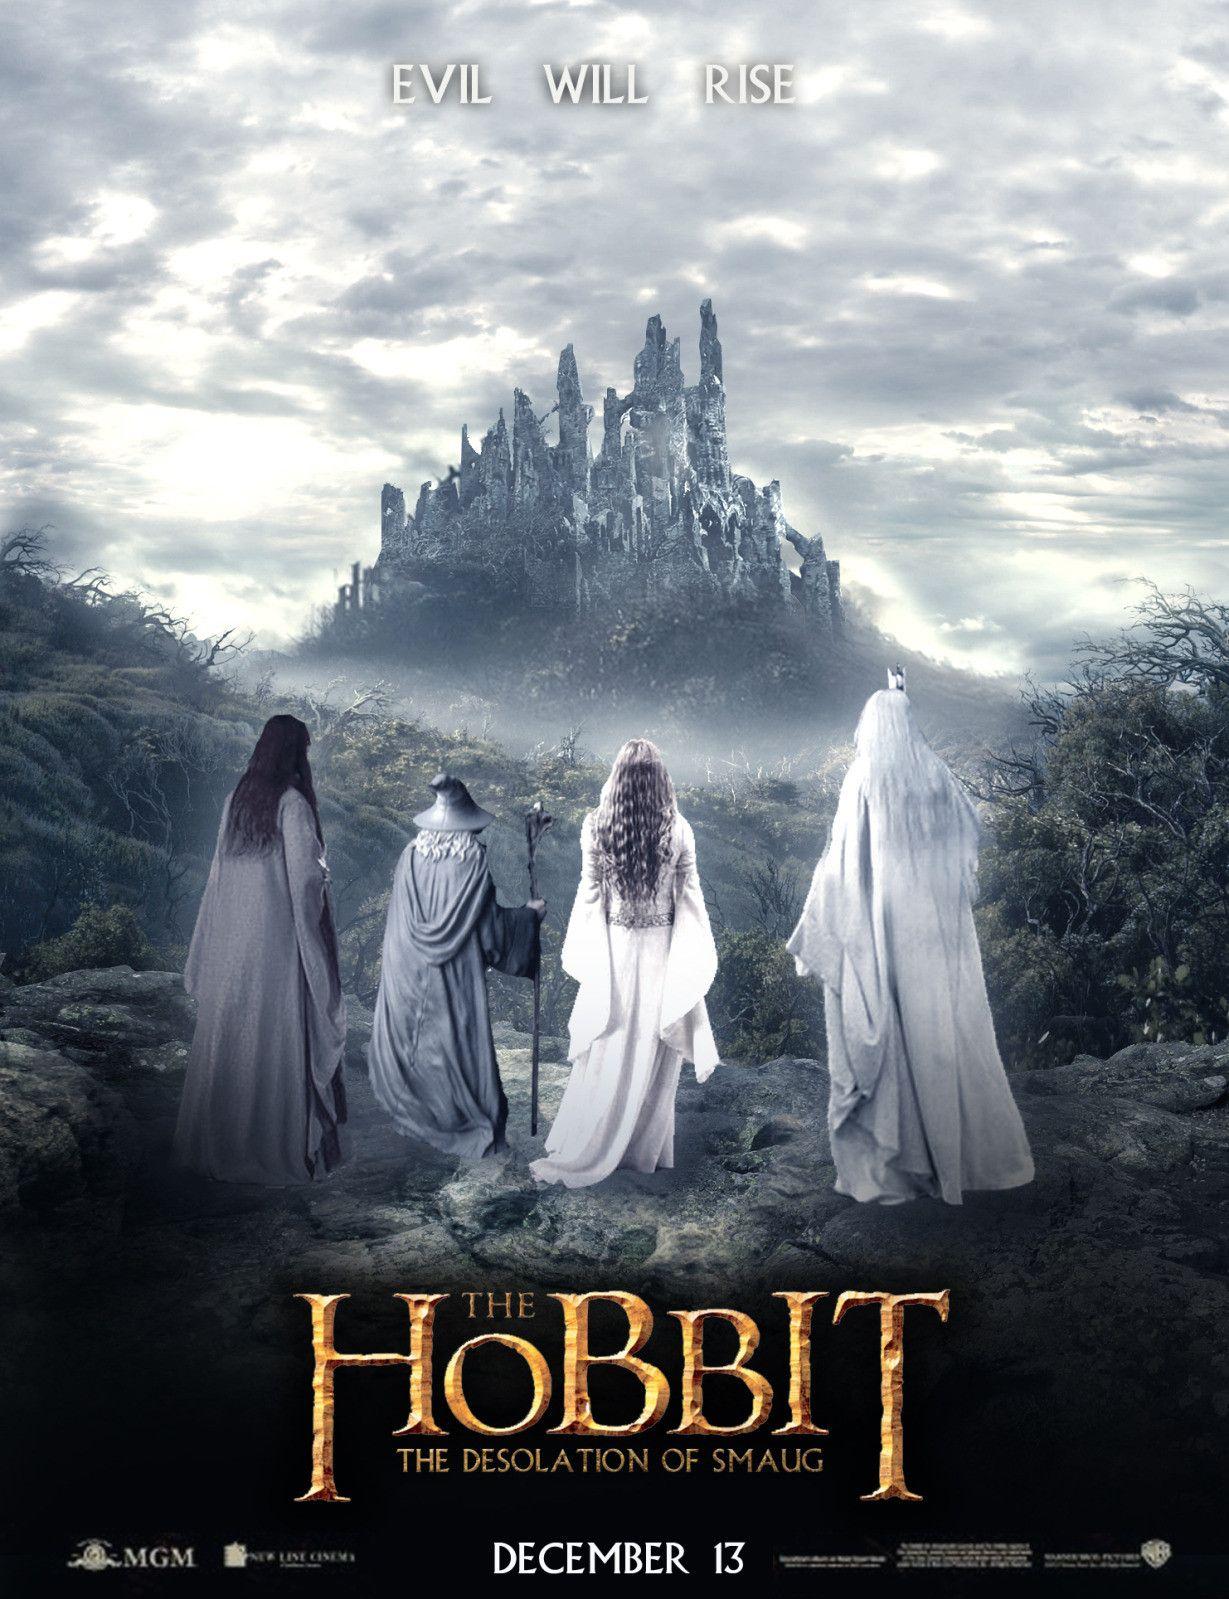 Hobbit Desolation Of Smaug Poster Maybe The Second Installment Will Be Better Than The First I Hope La Desolación De Smaug Hobbit El Señor De Los Anillos